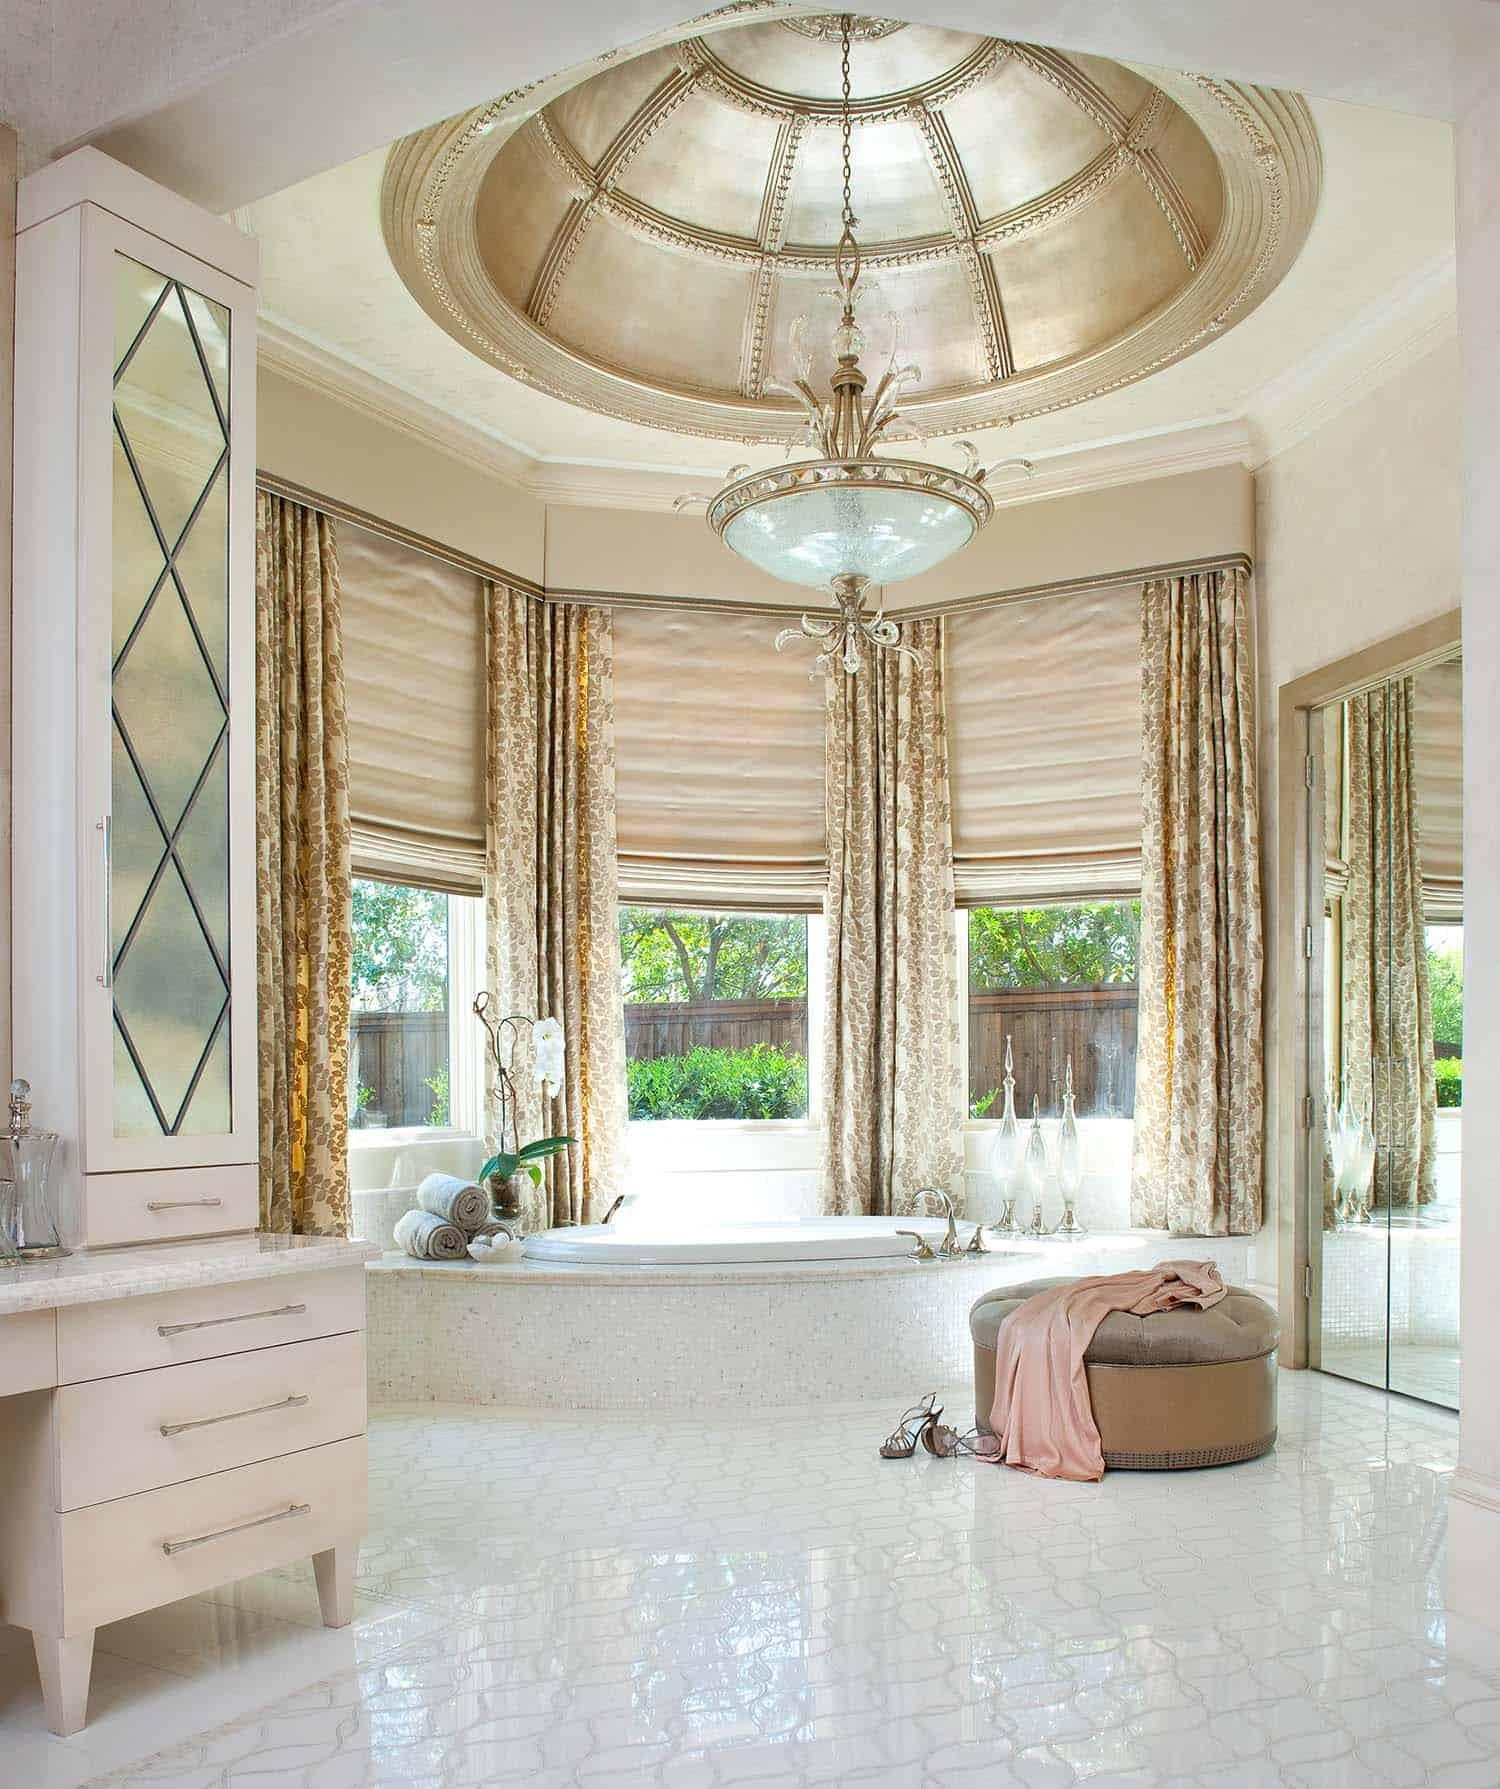 Contemporary Style Home-Dallas Design Group-19-1 Kindesign